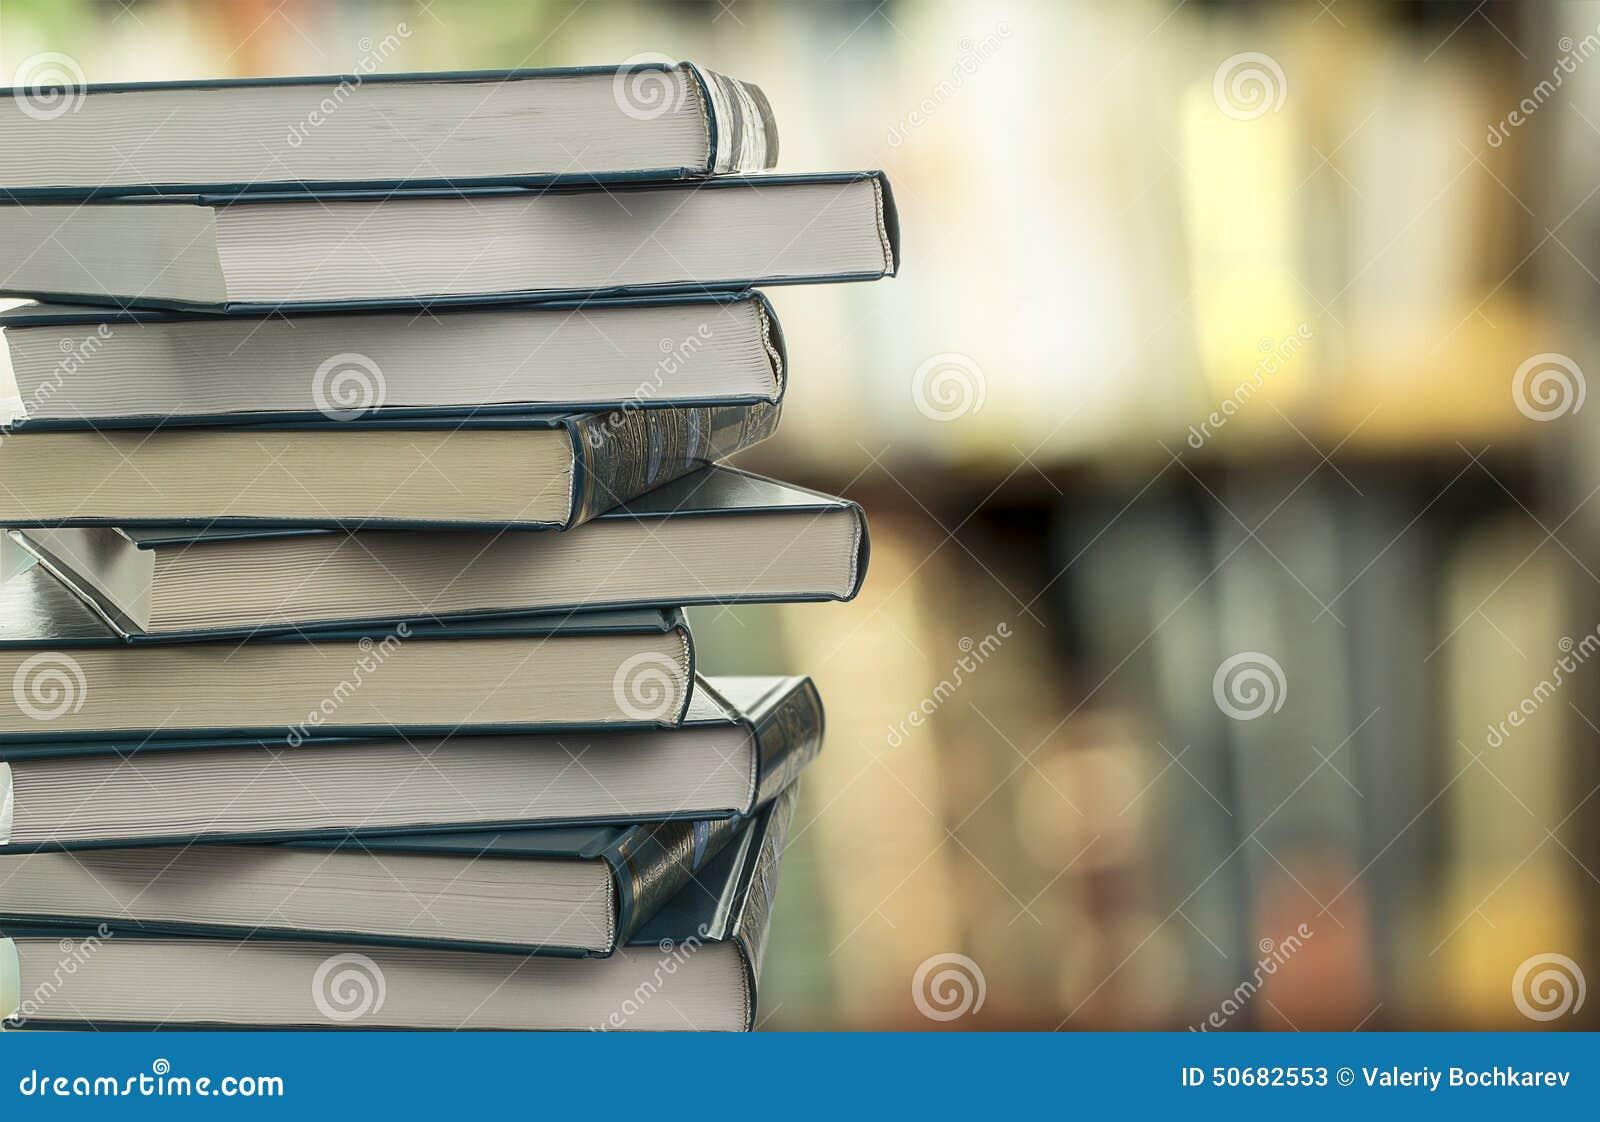 Download 堆在被弄脏的背景的书 库存图片. 图片 包括有 对象, 关闭, 知识, 了解, 钉书匠, 研究, 散开, 信息 - 50682553